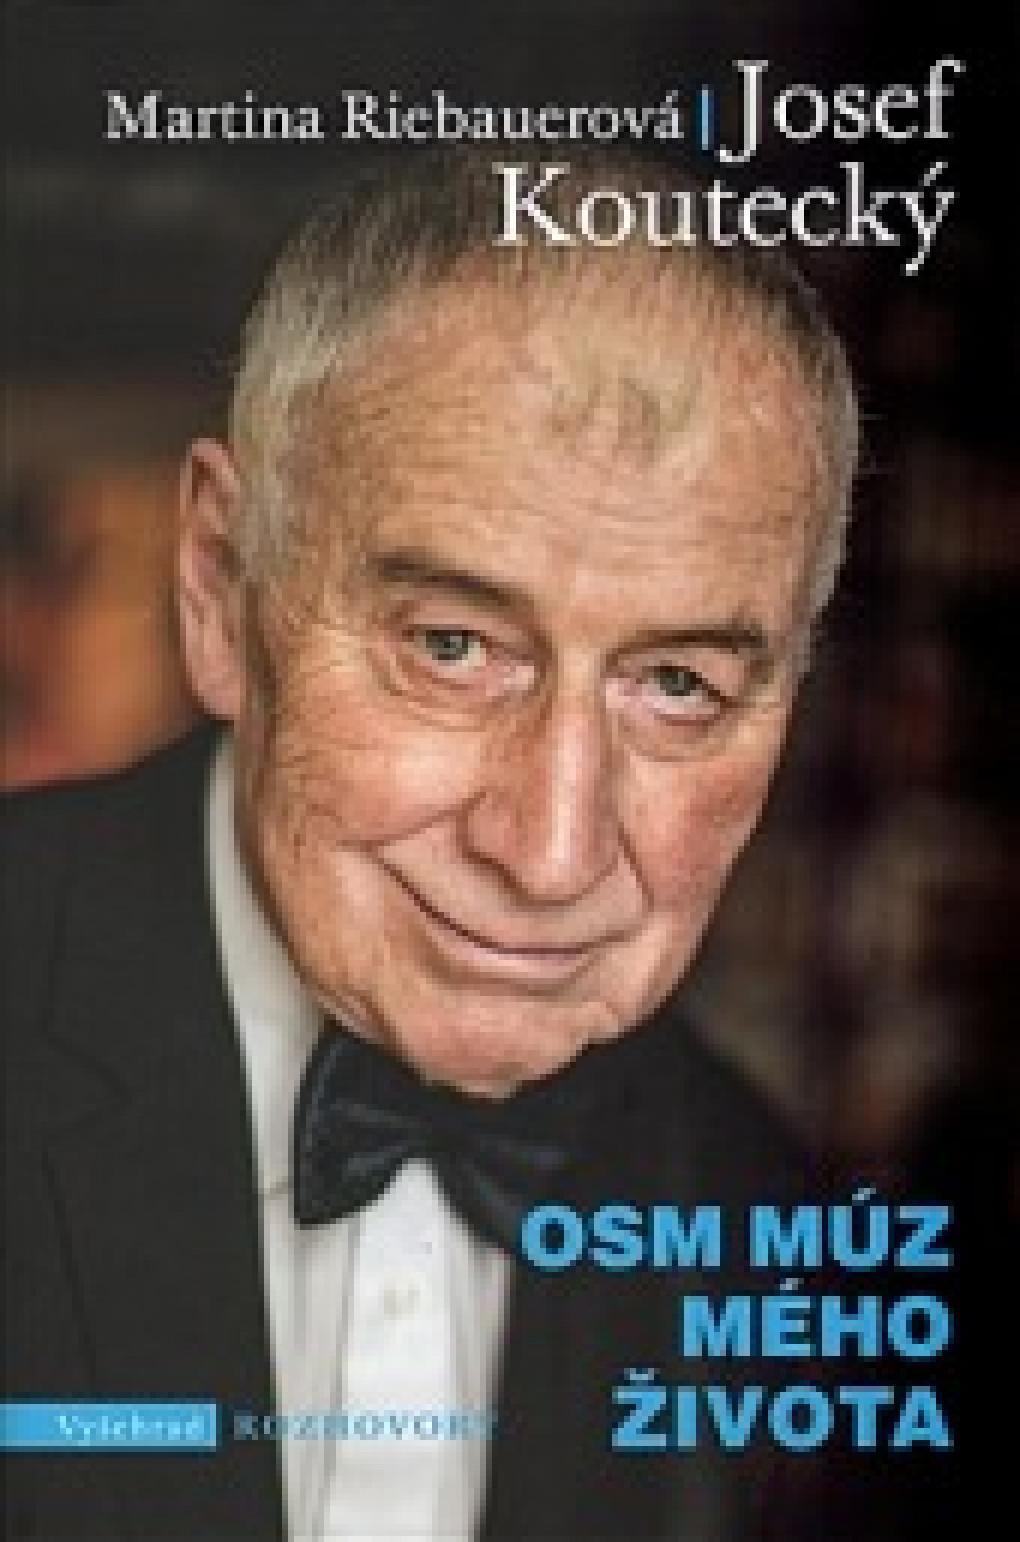 osm-muz-meho-zivota-axs-298925.jpg